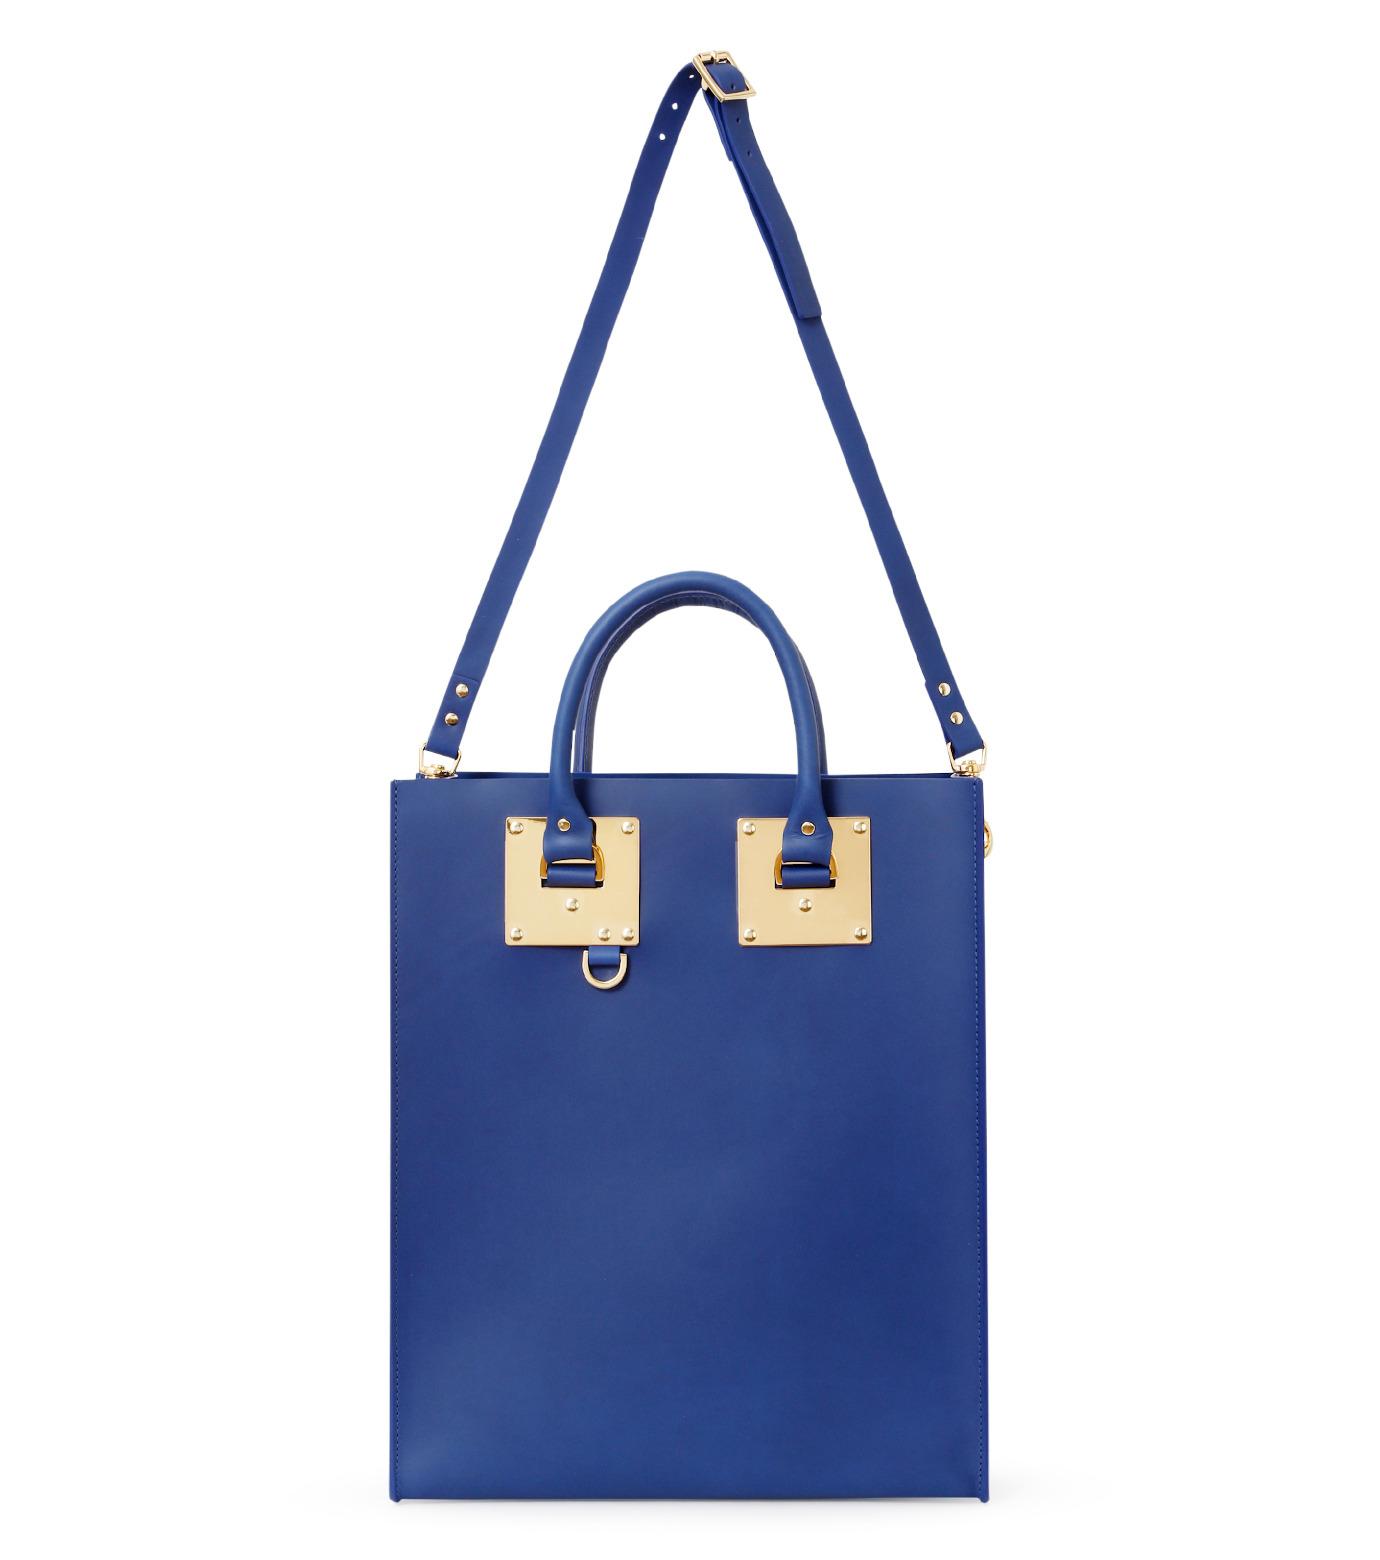 Sophie Hulme(ソフィーヒュルム)のLarge Tote Bag-BLUE(バッグ/bag)-BG047LE-L-92 拡大詳細画像1